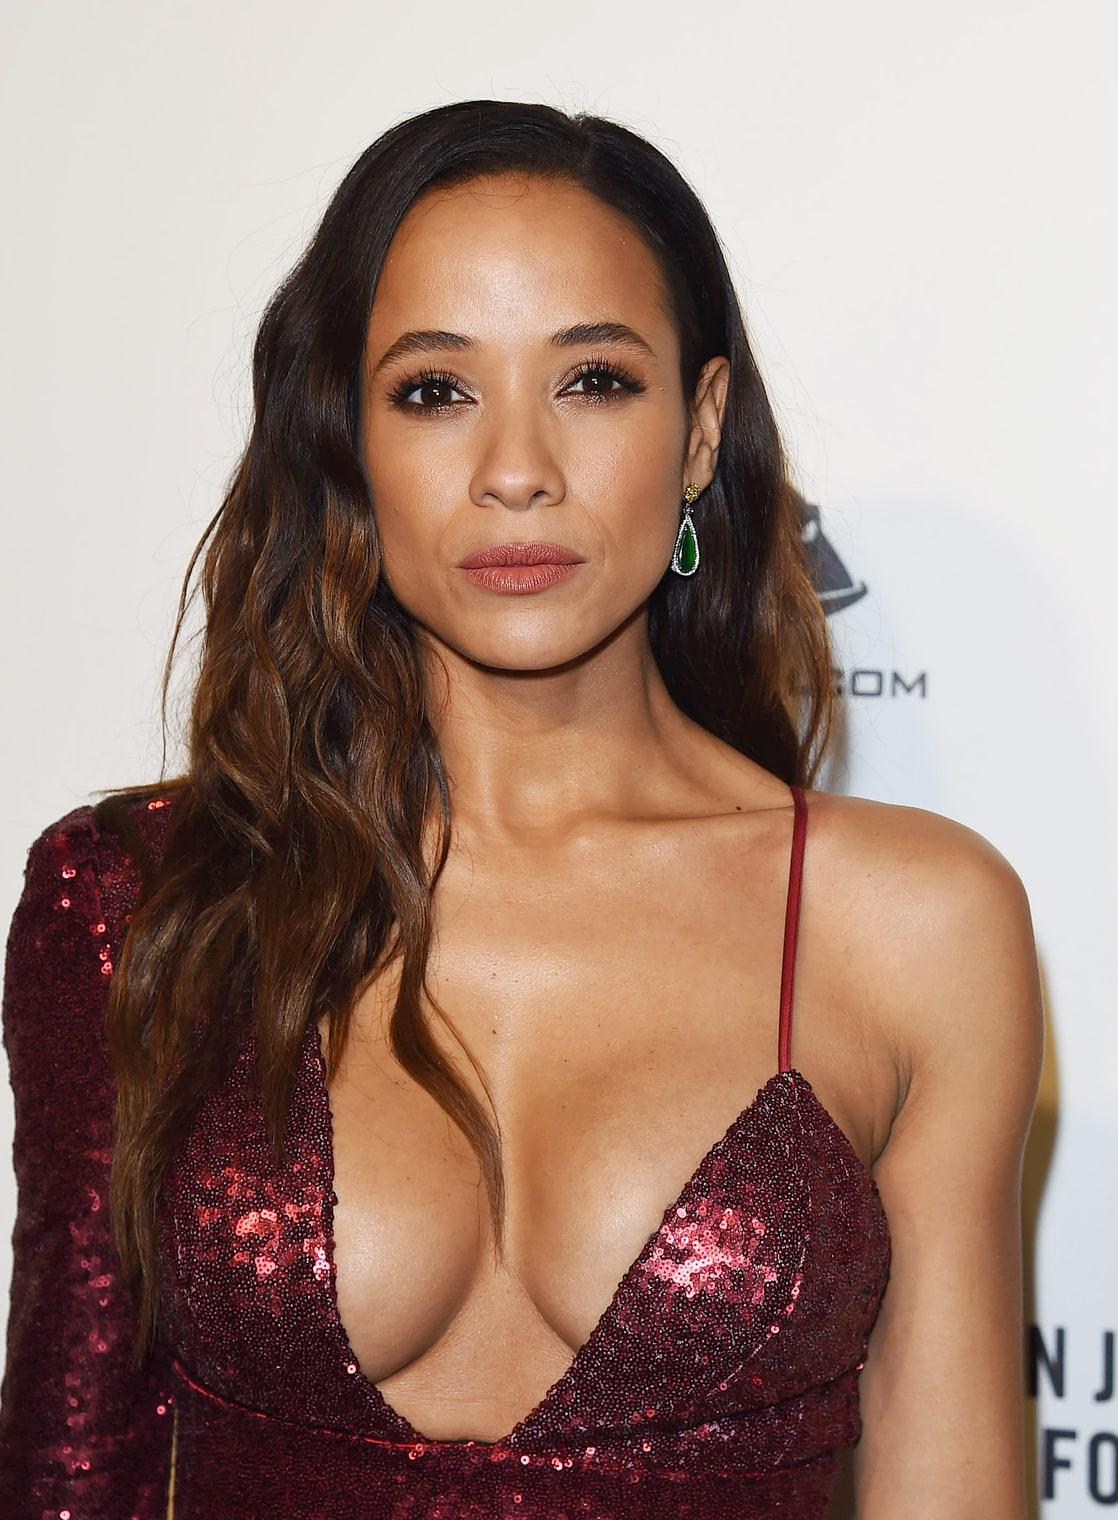 Nicole eggert porn star